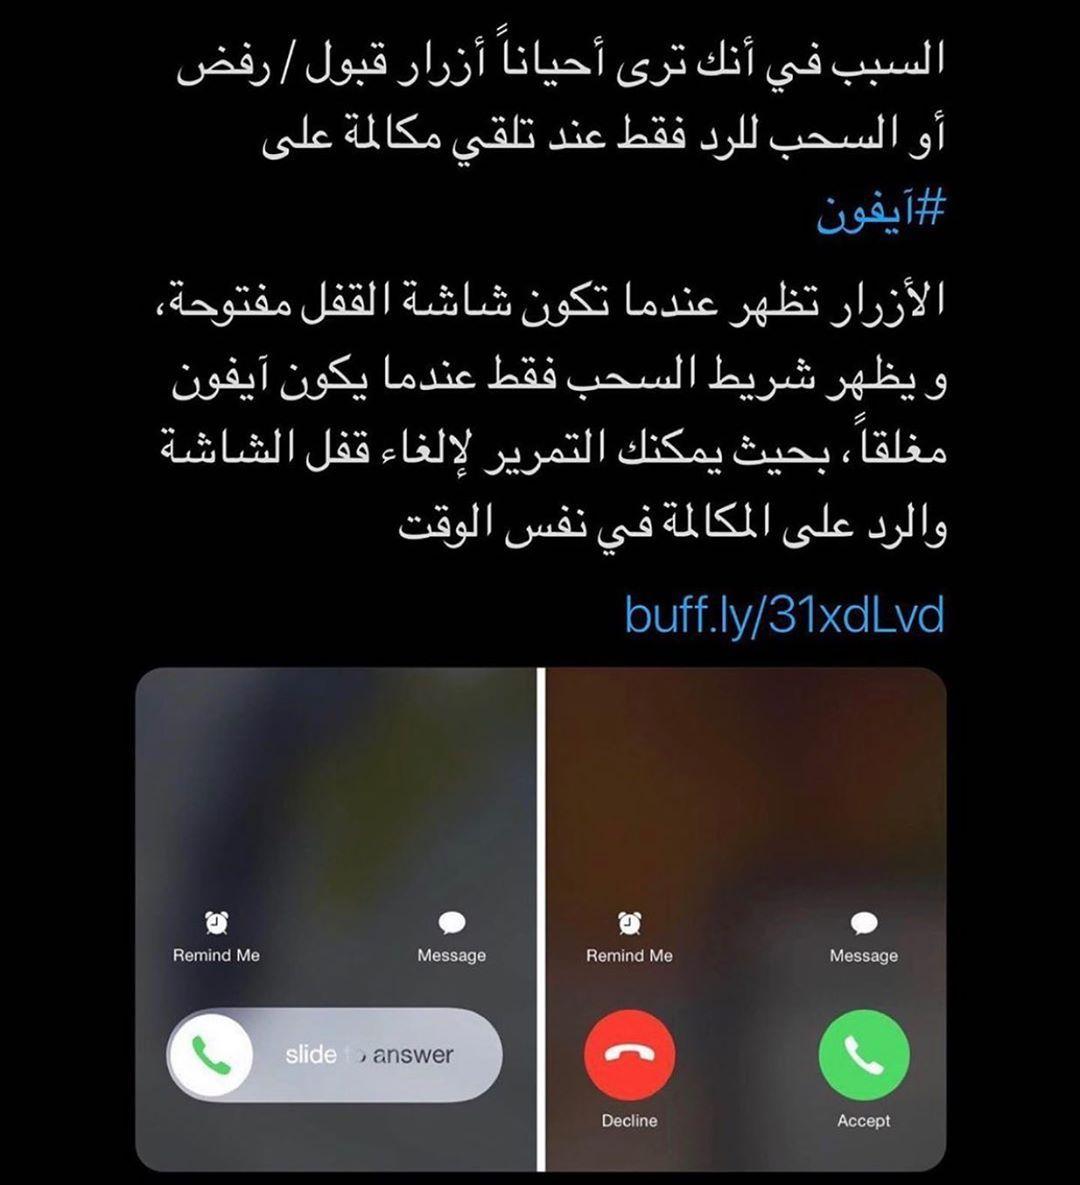 سوالف و قصص بدير 𓆩 𓆪 On Instagram اول مره تدري صح Emoji Wallpaper Iphone Application Iphone Iphone App Layout